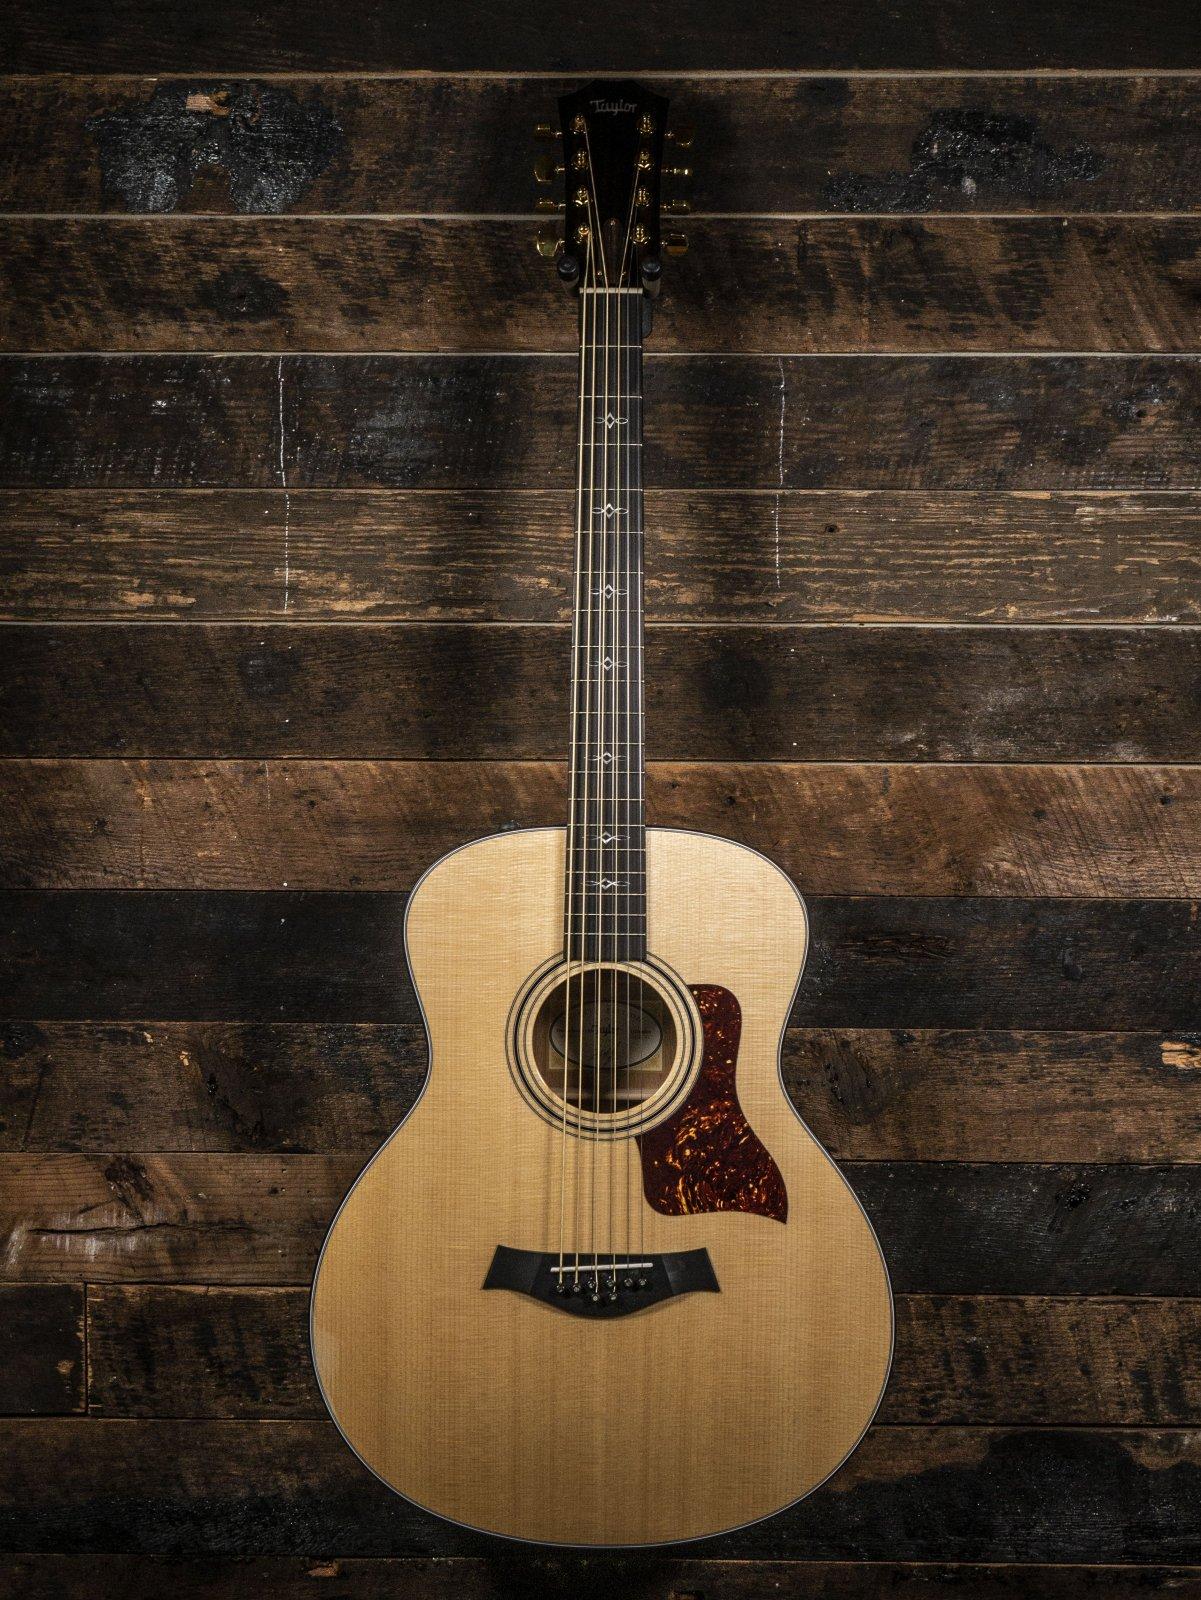 Taylor Limited Baritone 8 String 316e Natural Lutz Top